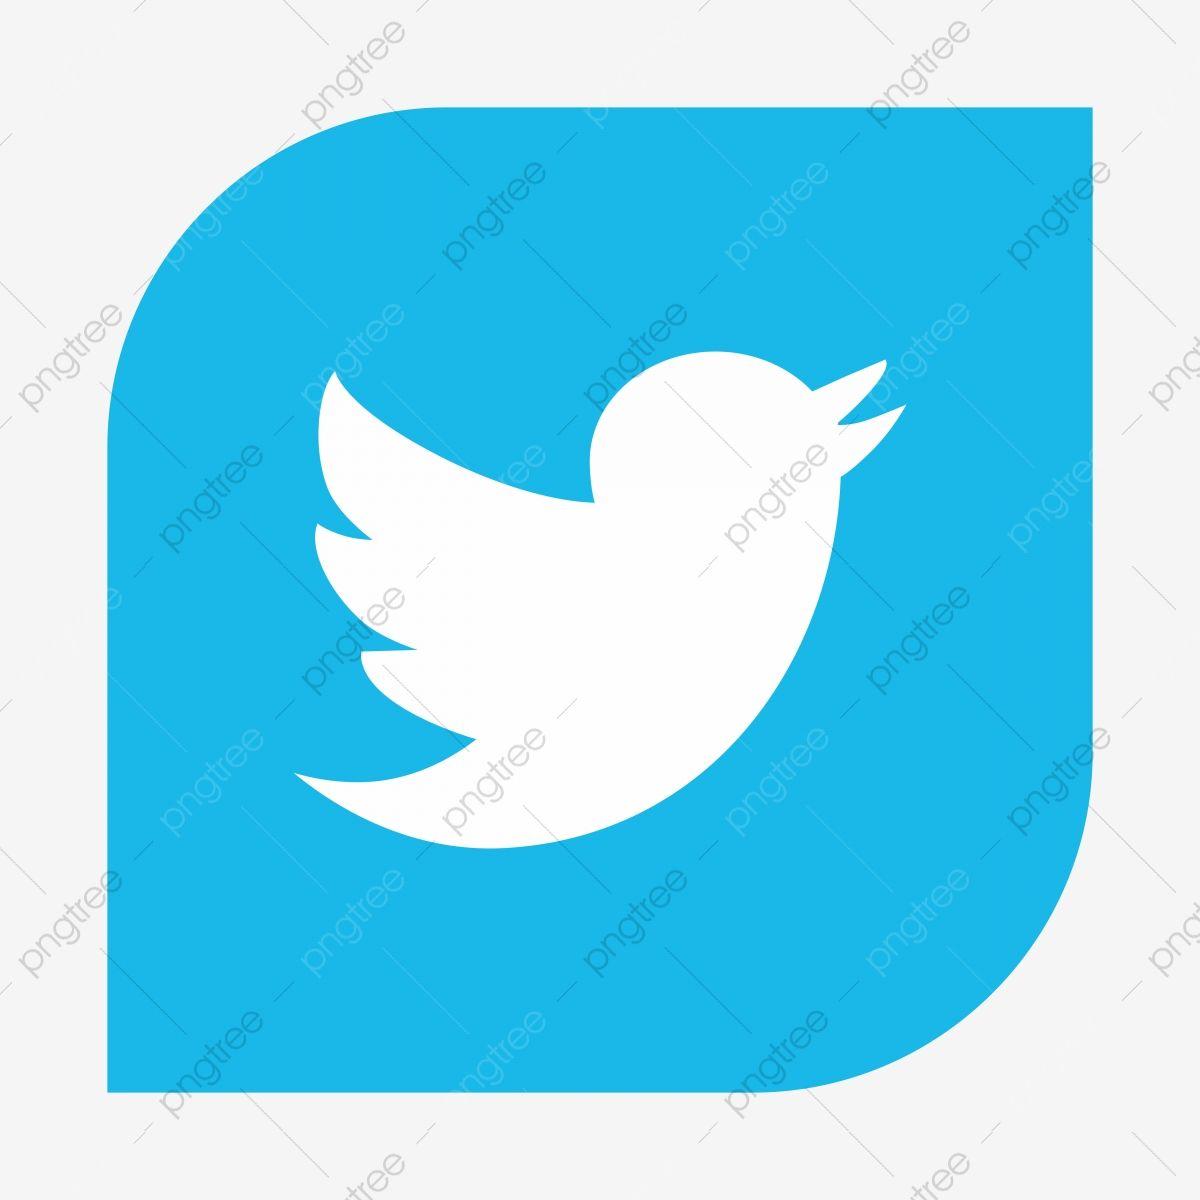 تويتر شعار بابوا نيو غينيا Twitter Logo Logos Nike Logo